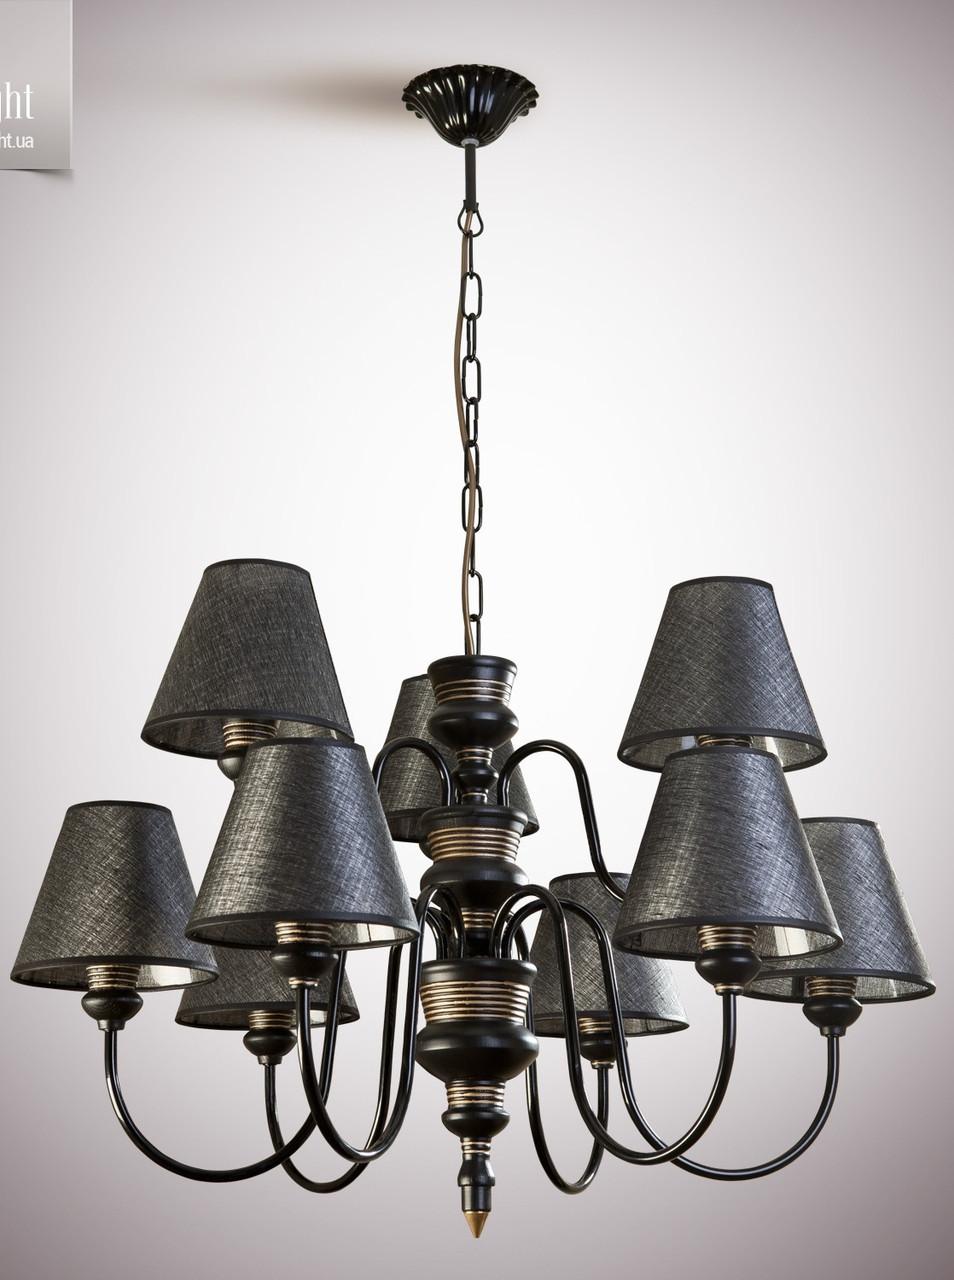 Люстра для зала, гостиной, 9-ти ламповая с абажурами  14409-1